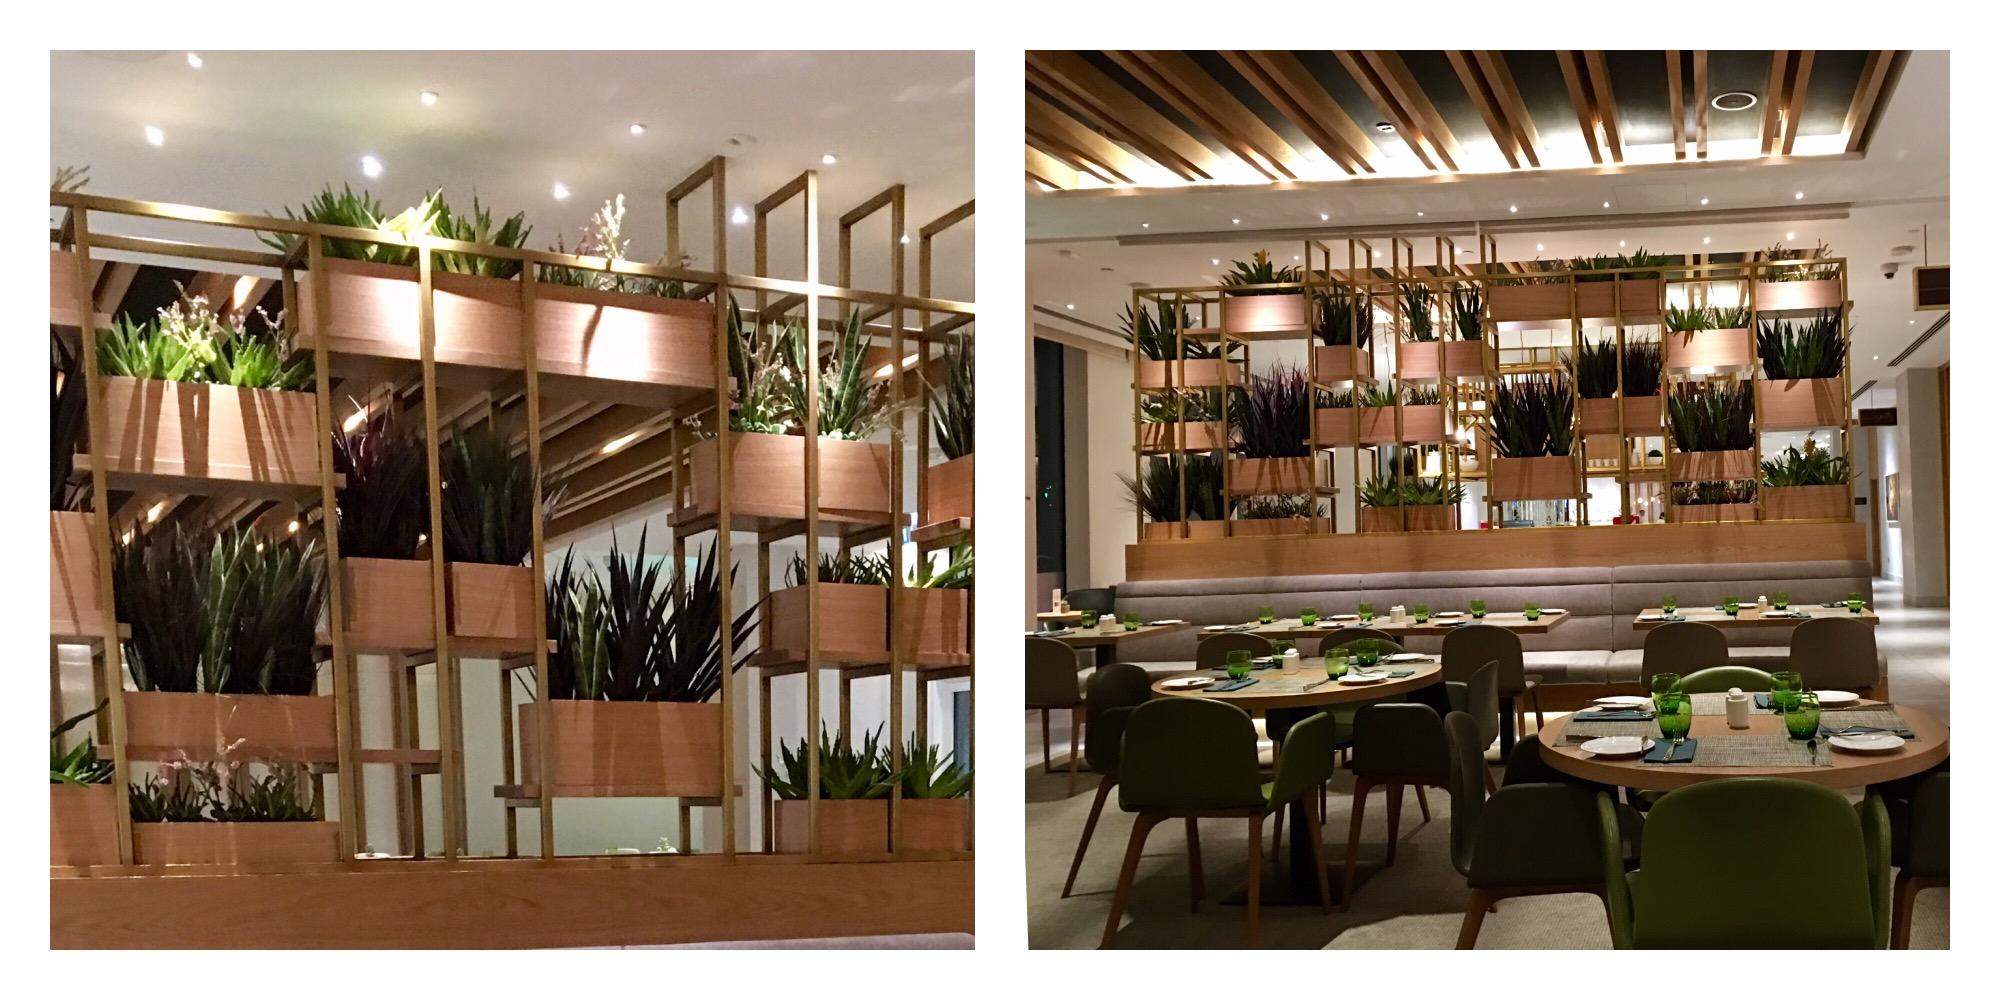 The Garden Grille-Hilton Garden Inn – megsblogged.com